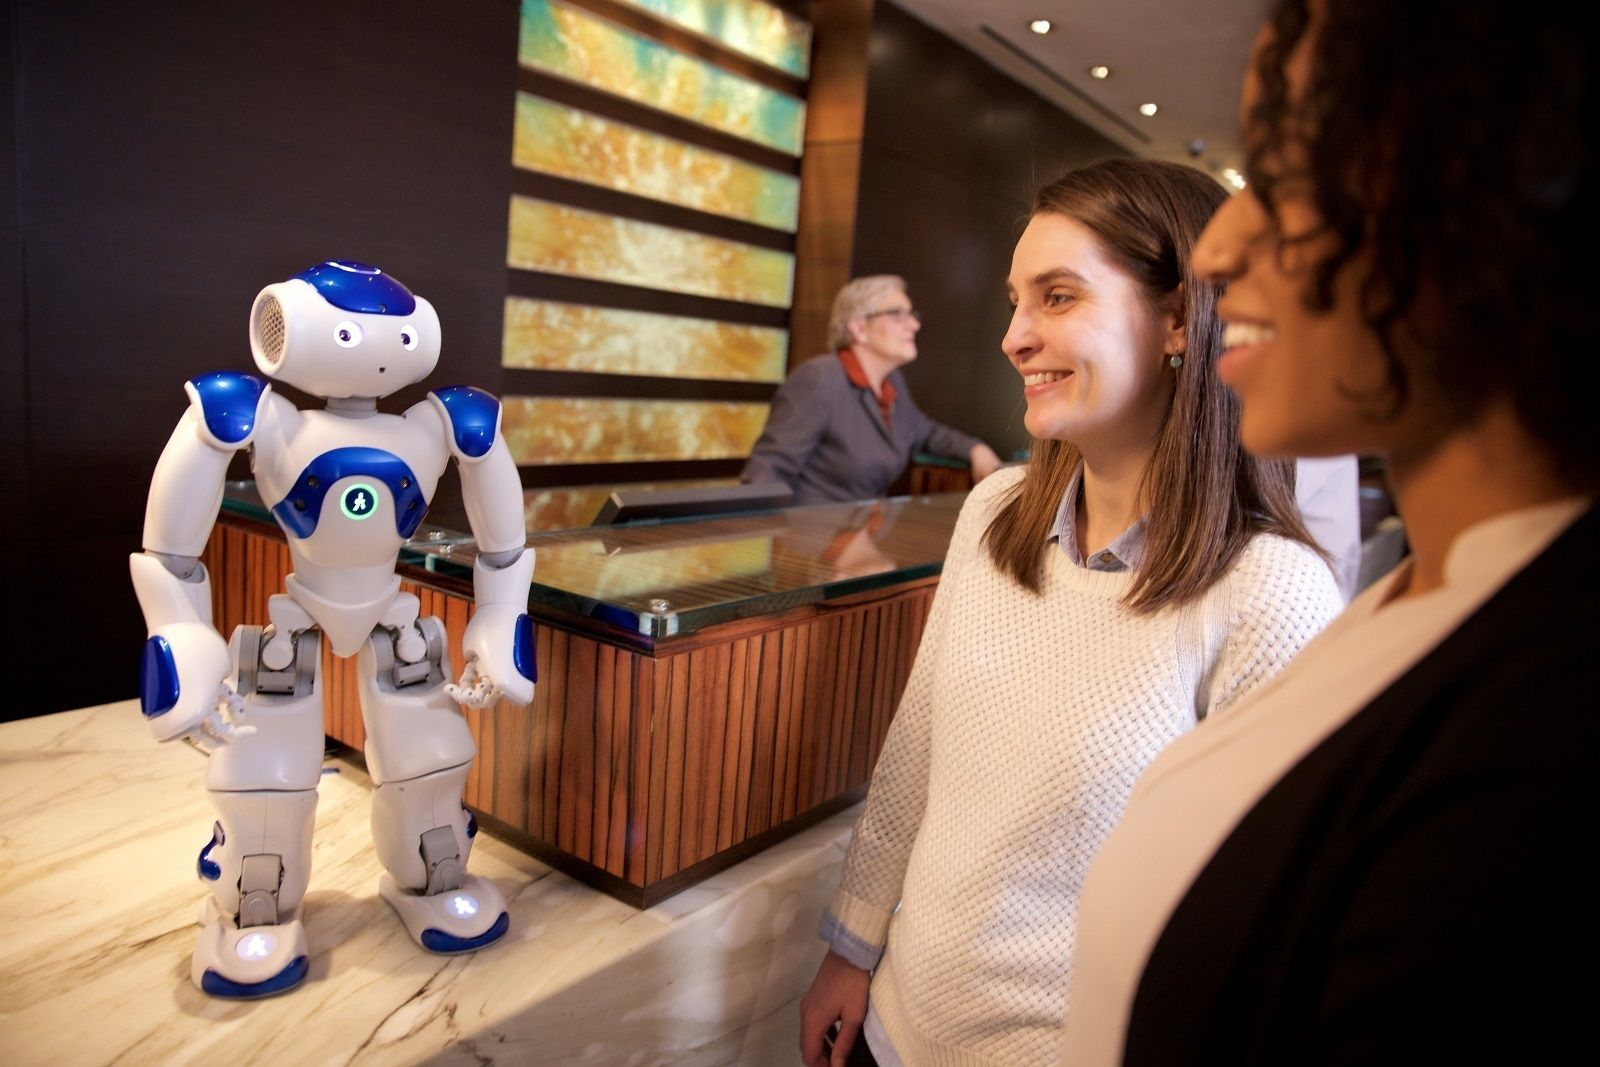 robot hilton ibm watson receptionist concierge